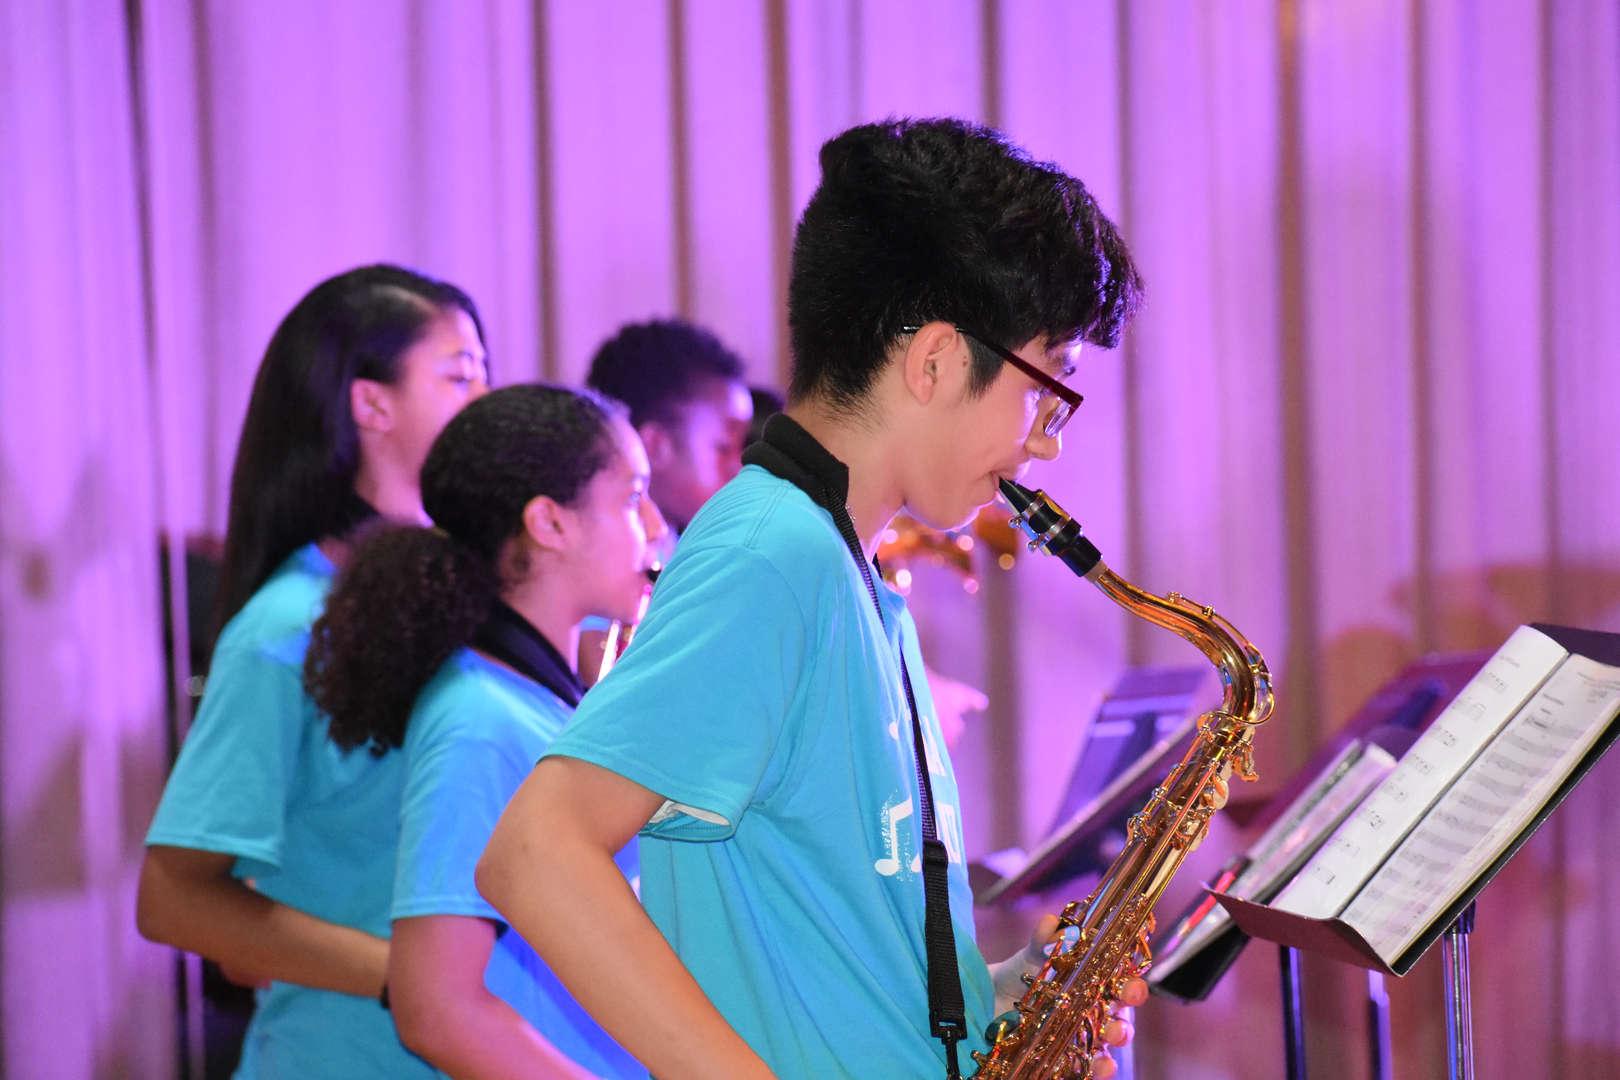 NSLA Band performing